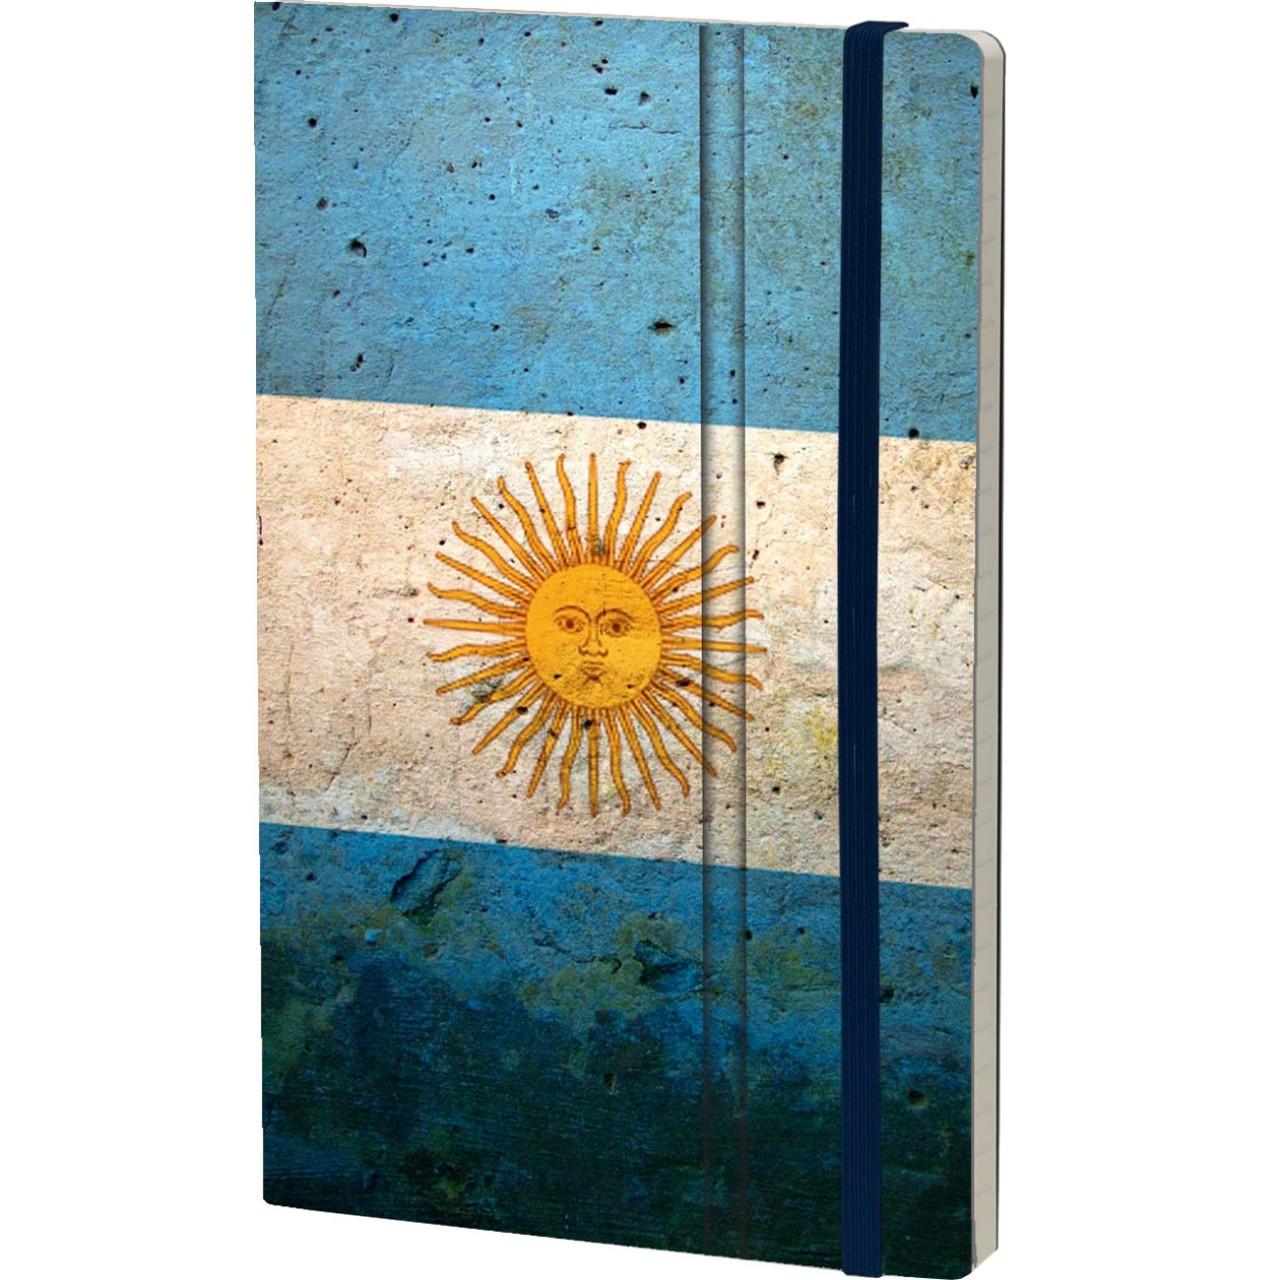 Stifflexible Notizbuch HISTORICAL NOTES 13 x 21 cm 192 S., VAMOS, VAMOS ARGENTINA (Argentina Flag)